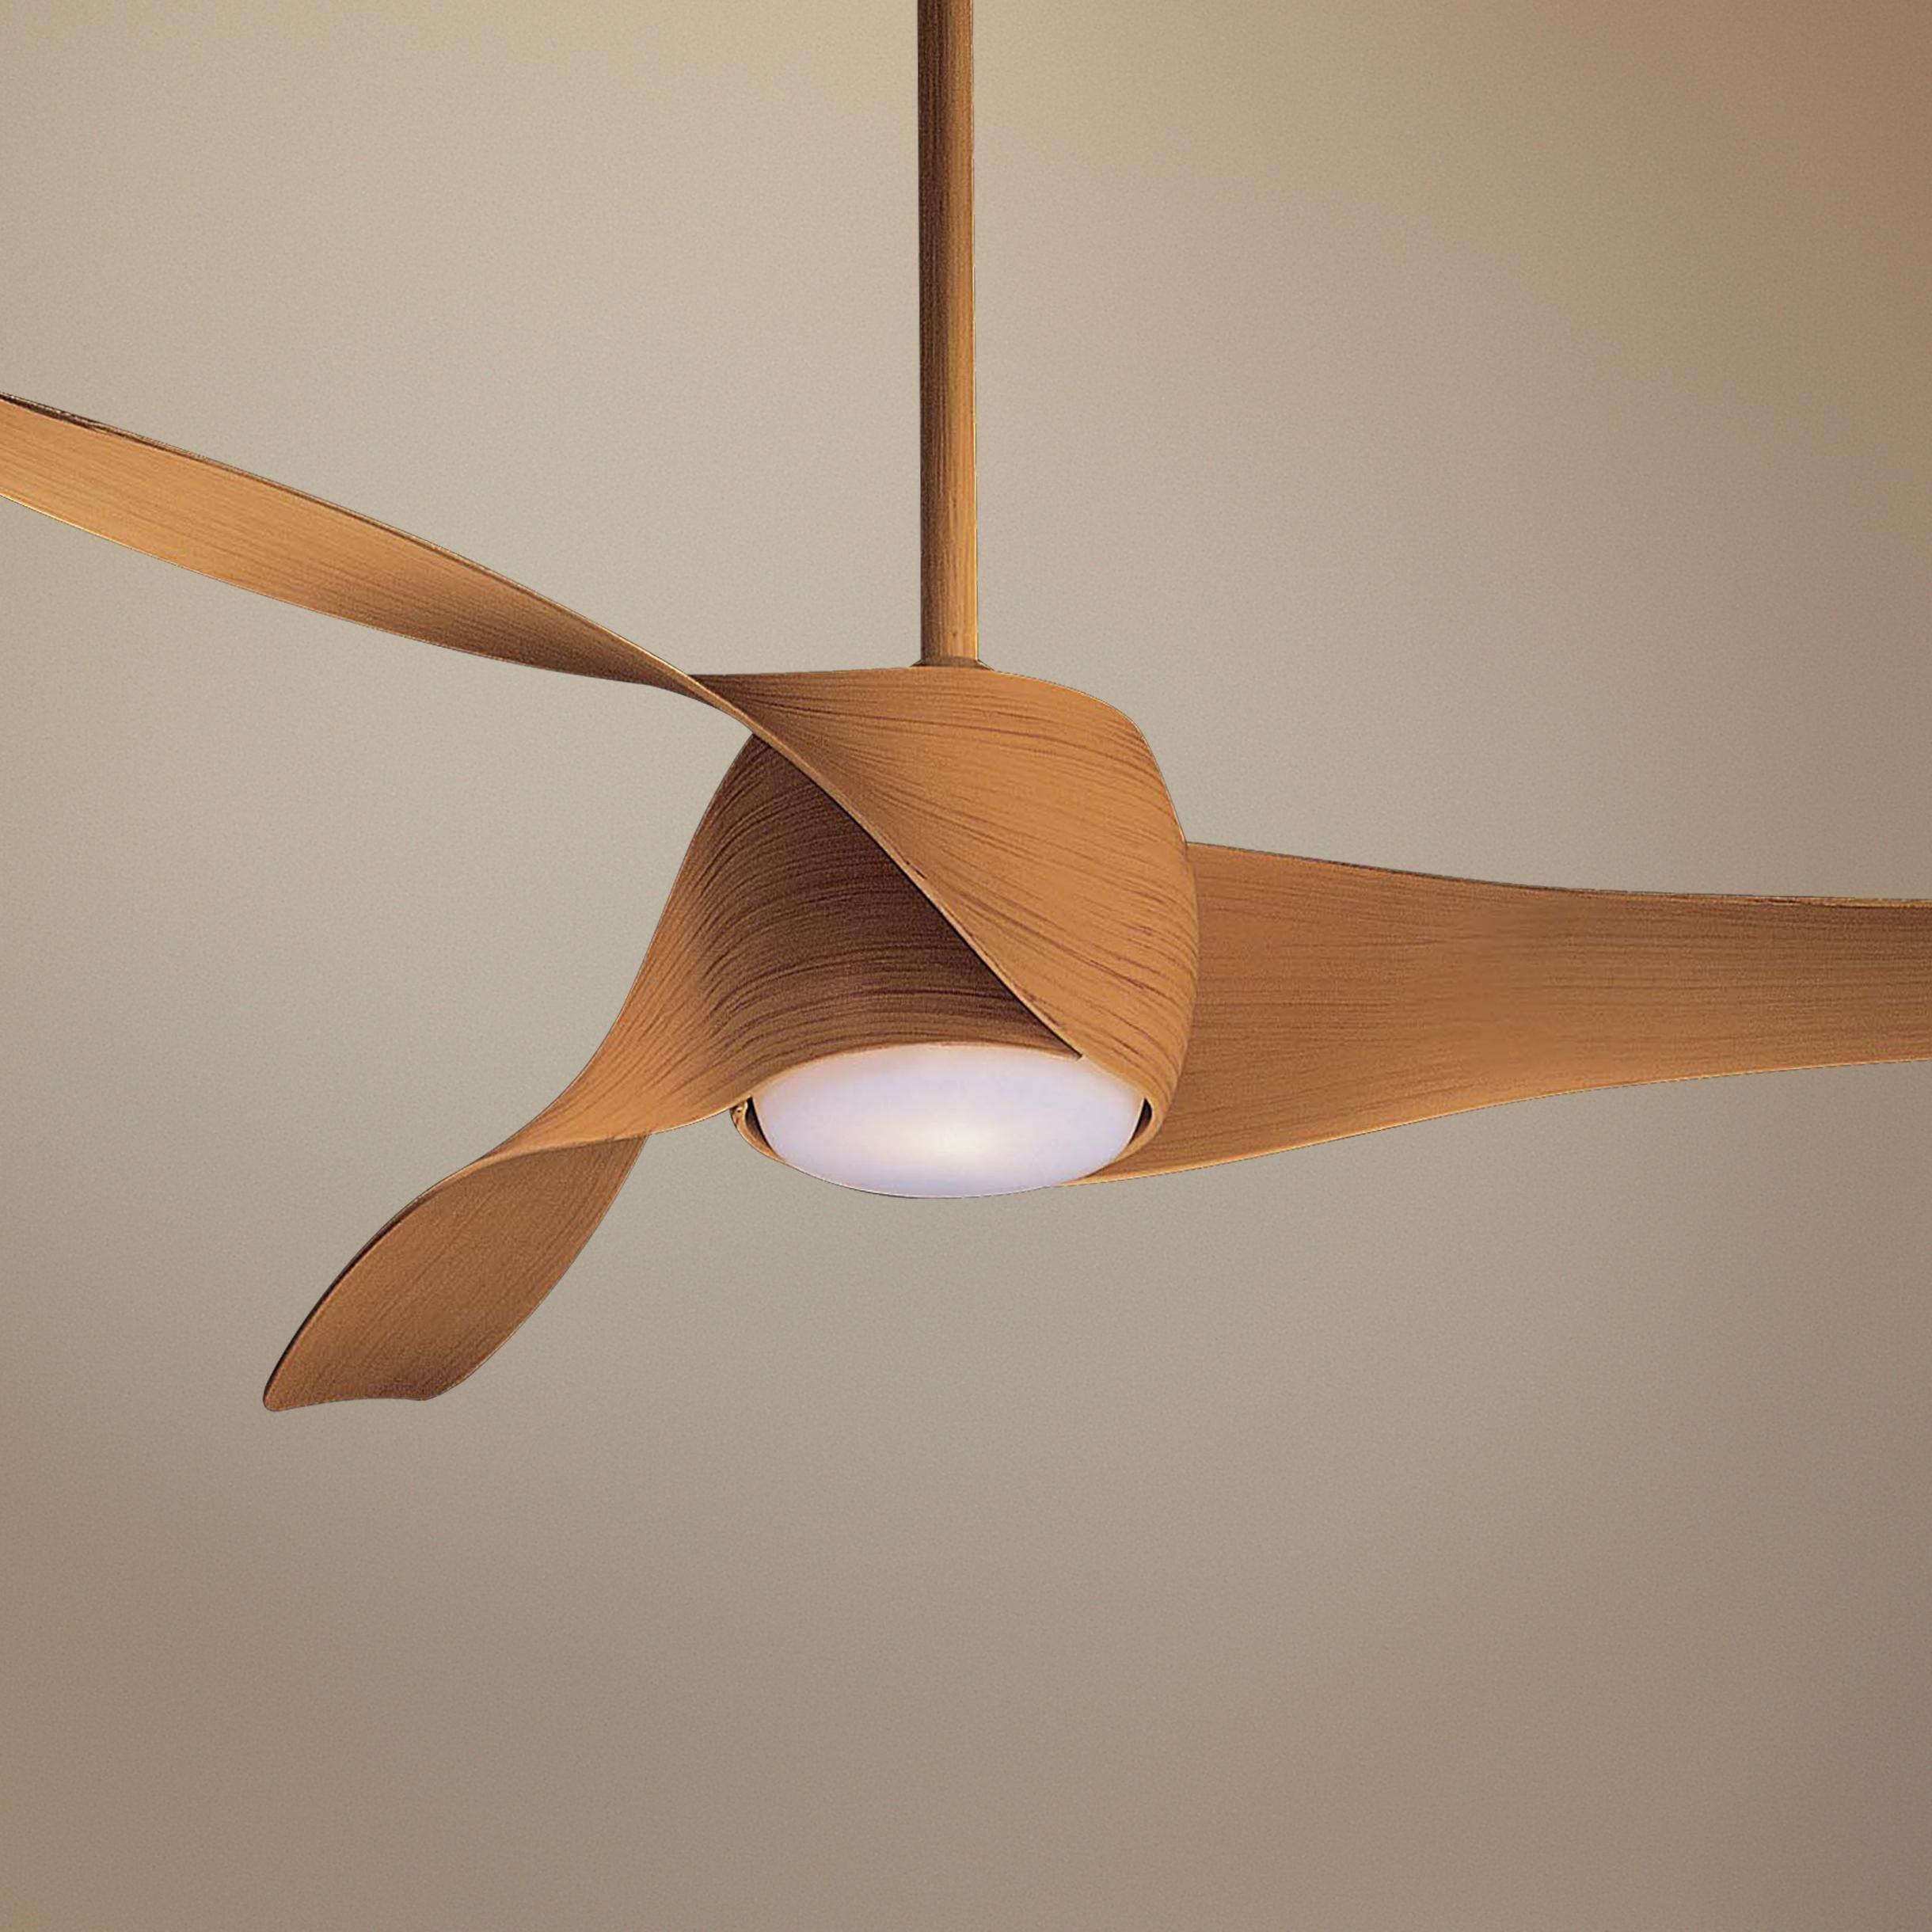 58 Quot Artemis Maple Finish Ceiling Fan Lampsplus Com